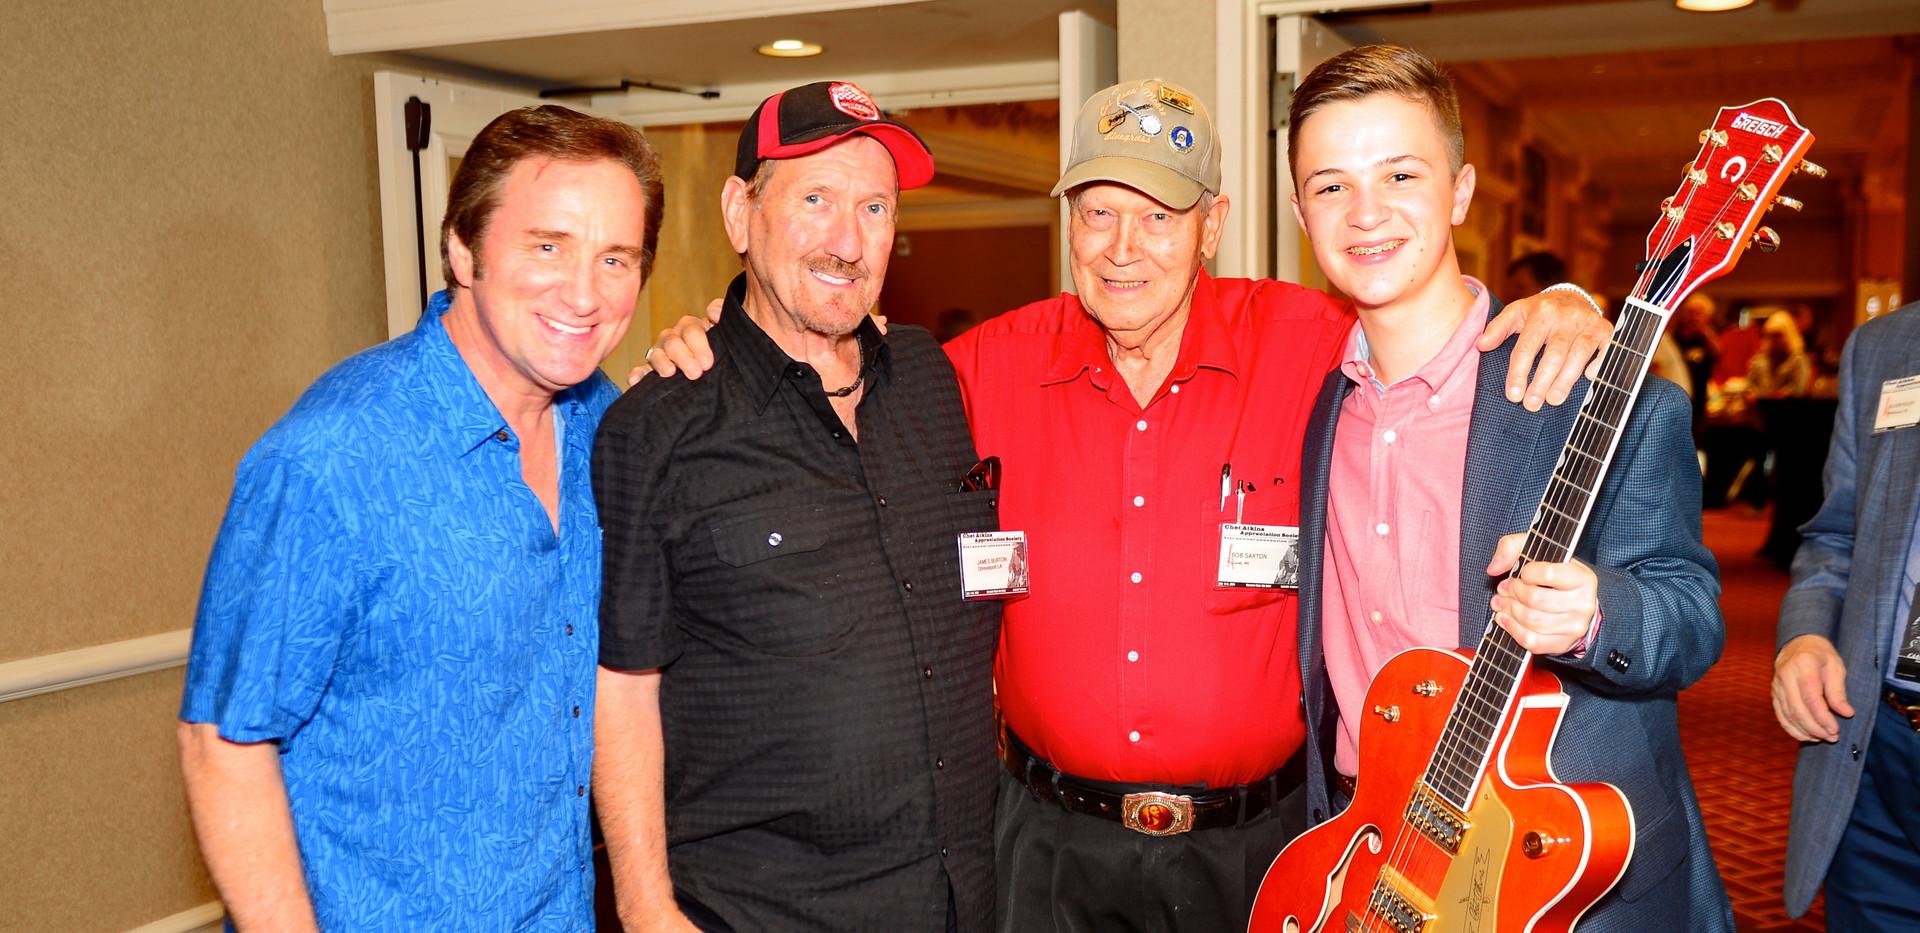 Darrell, James Burton, Bob Saxton and Pa